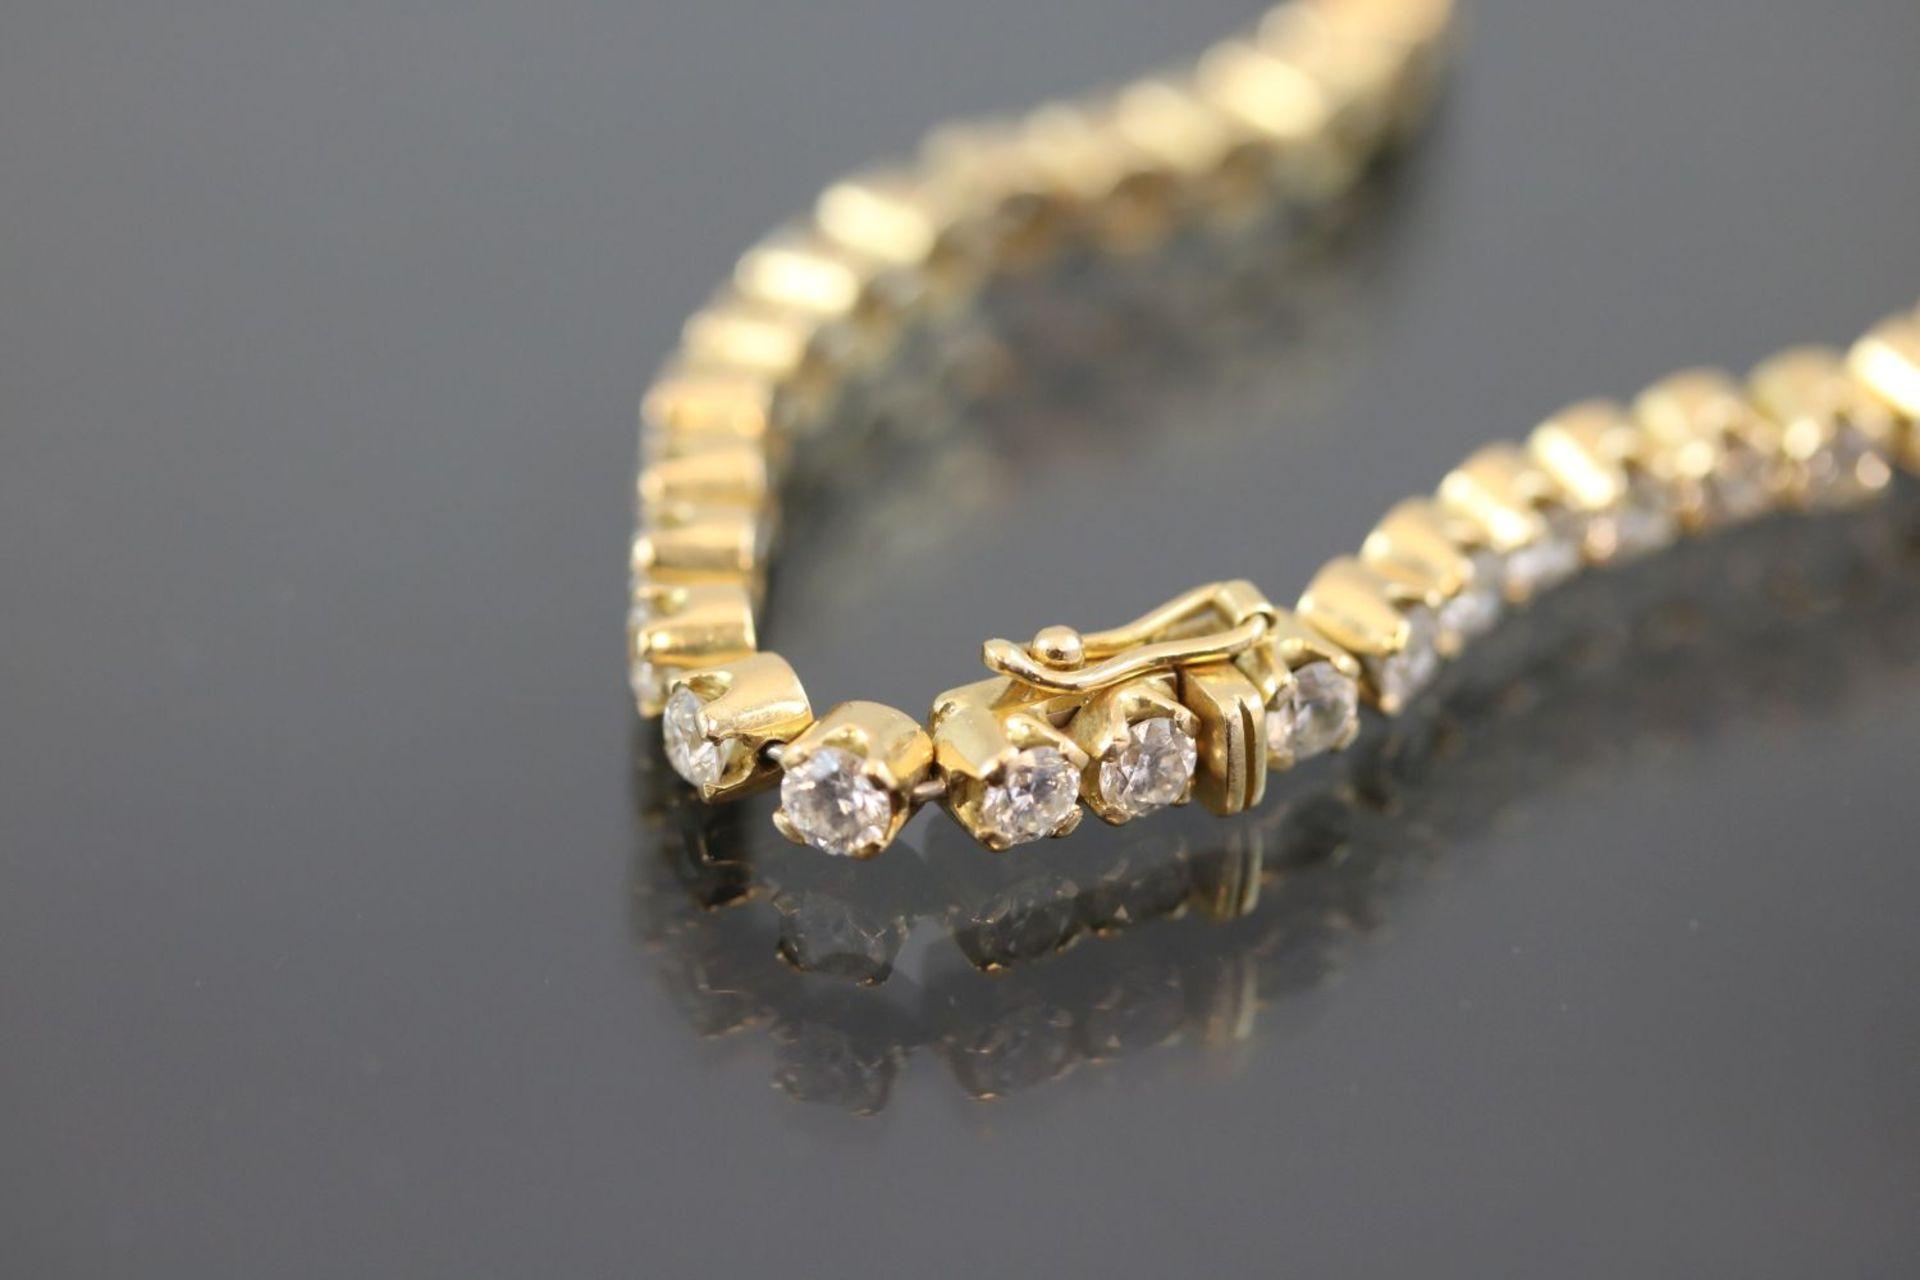 Los 6 - Brillant-Armband, 750 Gelbgold16,9 Gramm Brillanten, 5 ct., w/si. Länge: 19 cm